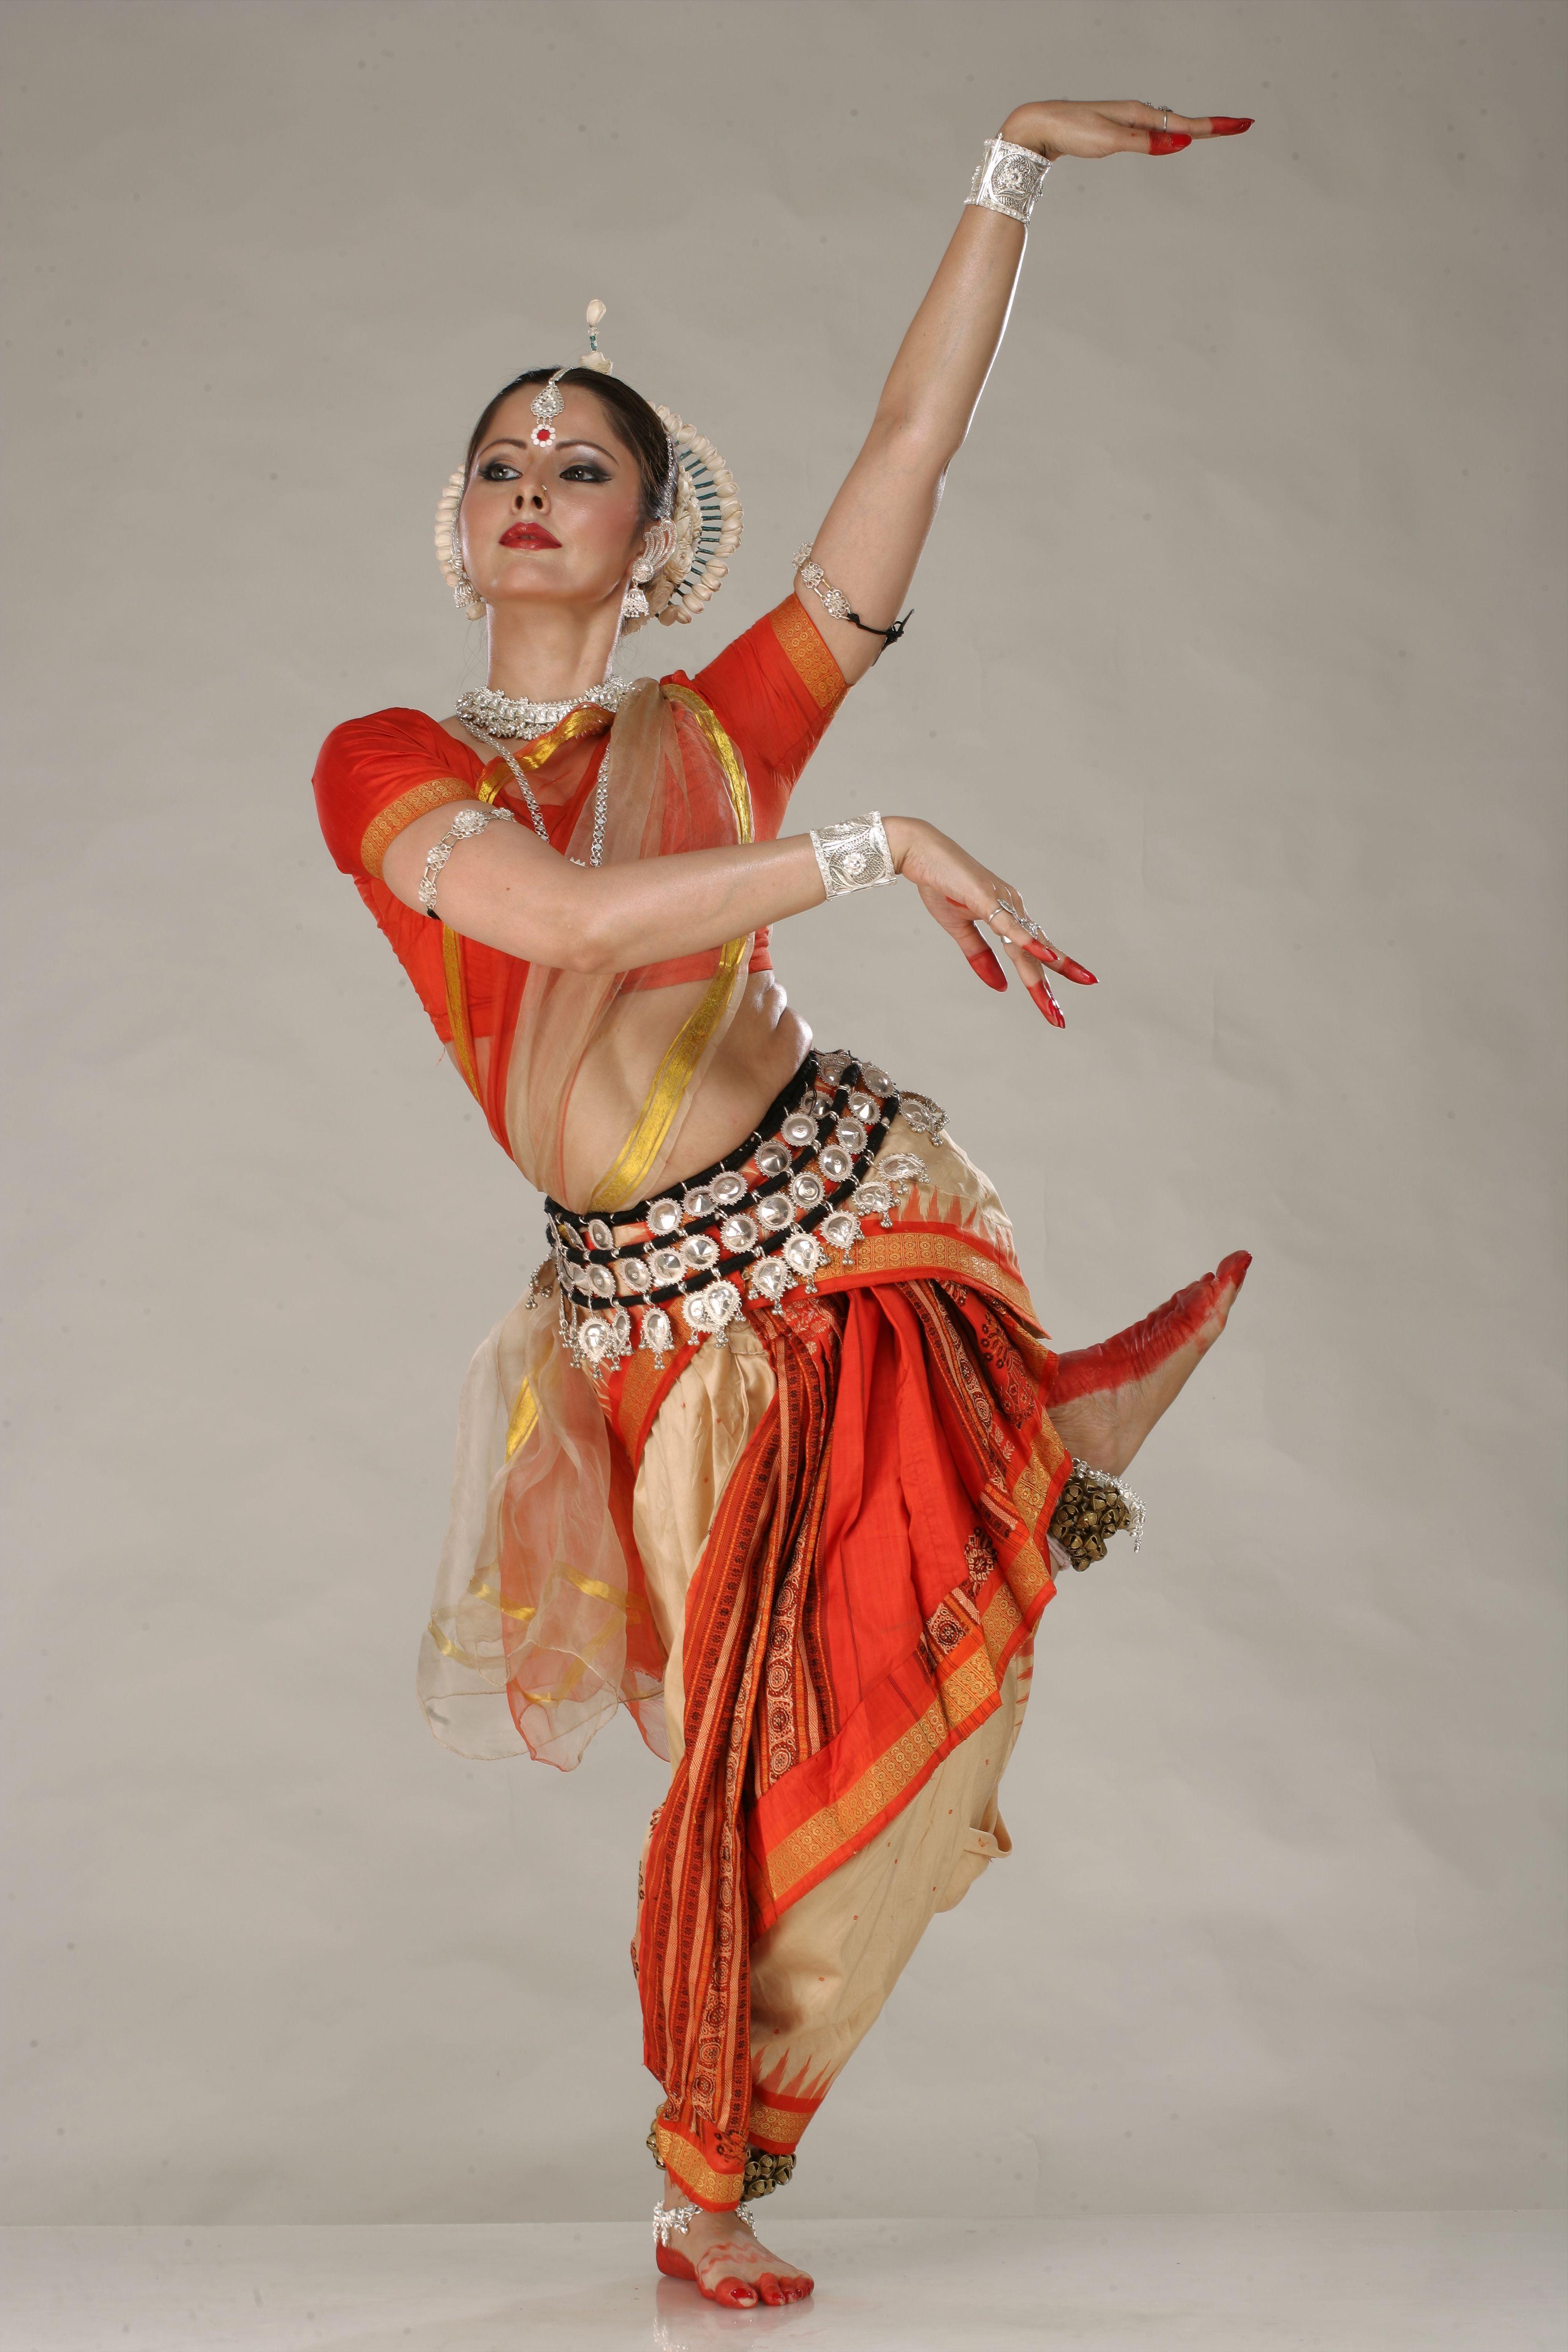 odissi dance poses - Google Search